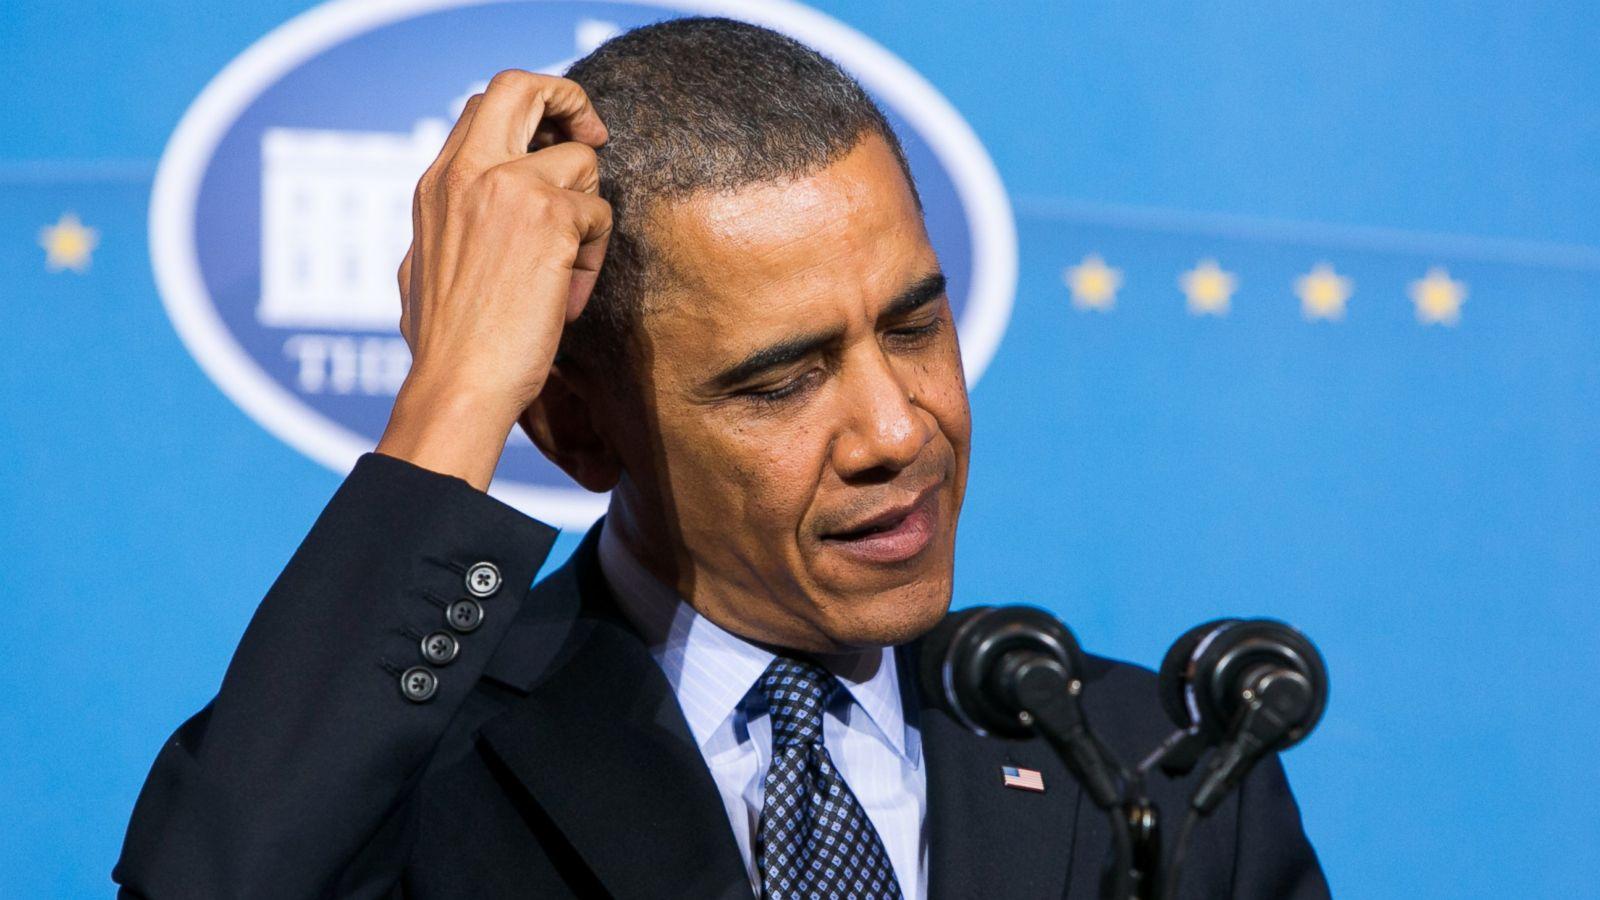 PHOTO  President Barack Obama HD Wallpaper